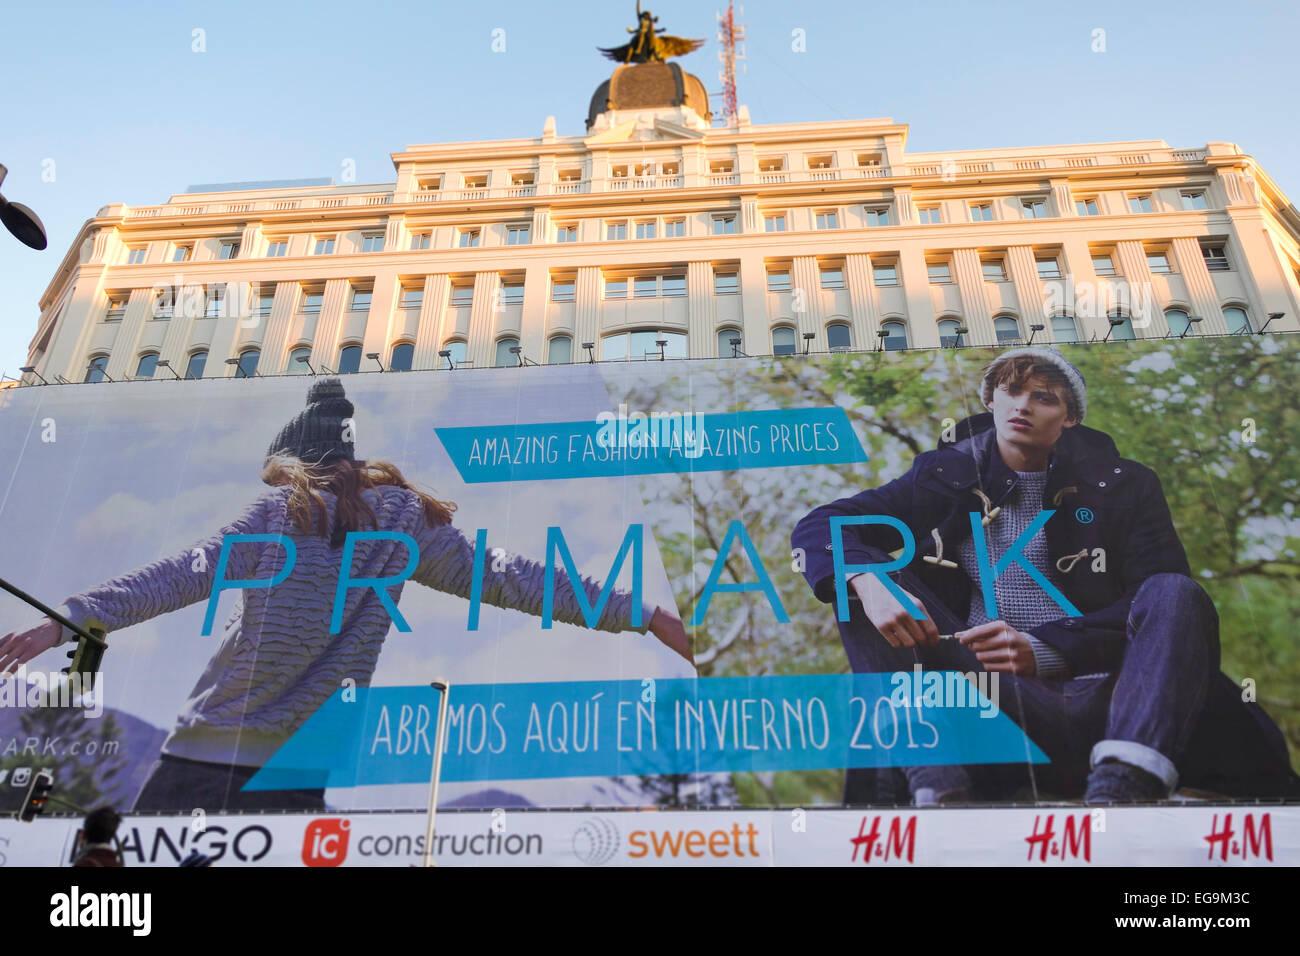 Building Paris-Madrid with huge advertisement opening Primark, Madrid, Spain. - Stock Image